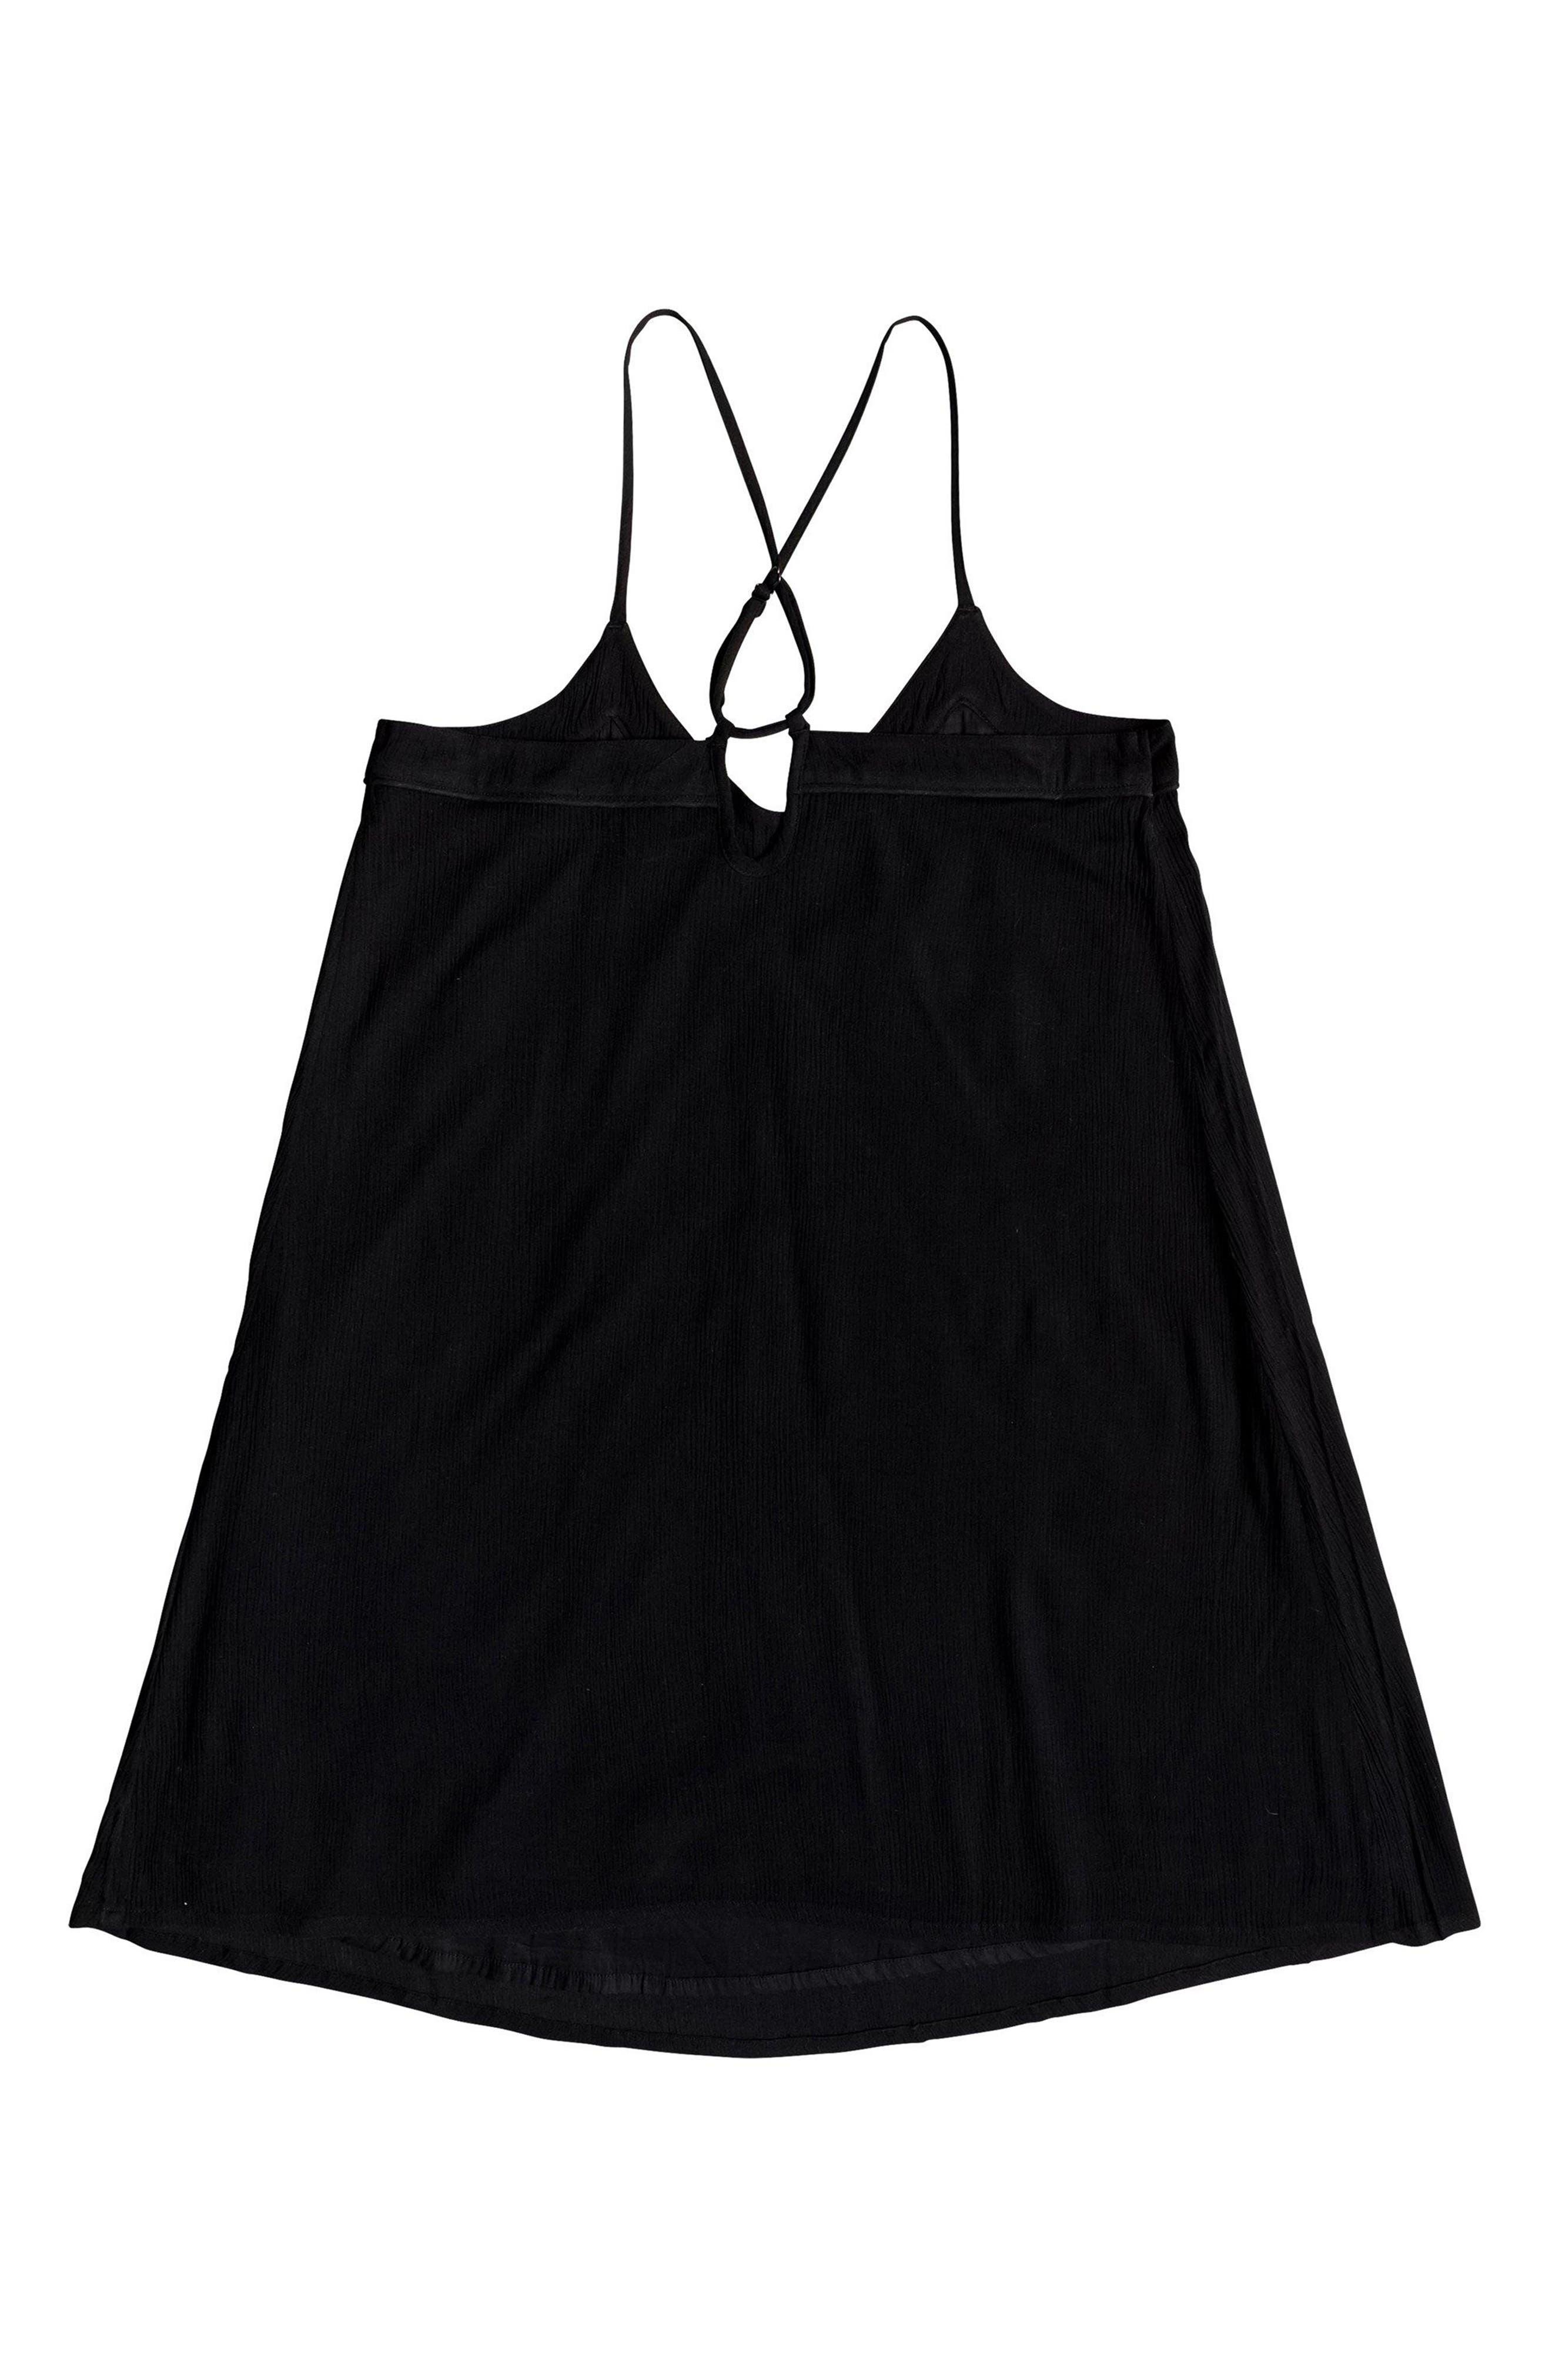 ROXY,                             Off We Go Minidress,                             Alternate thumbnail 4, color,                             TRUE BLACK